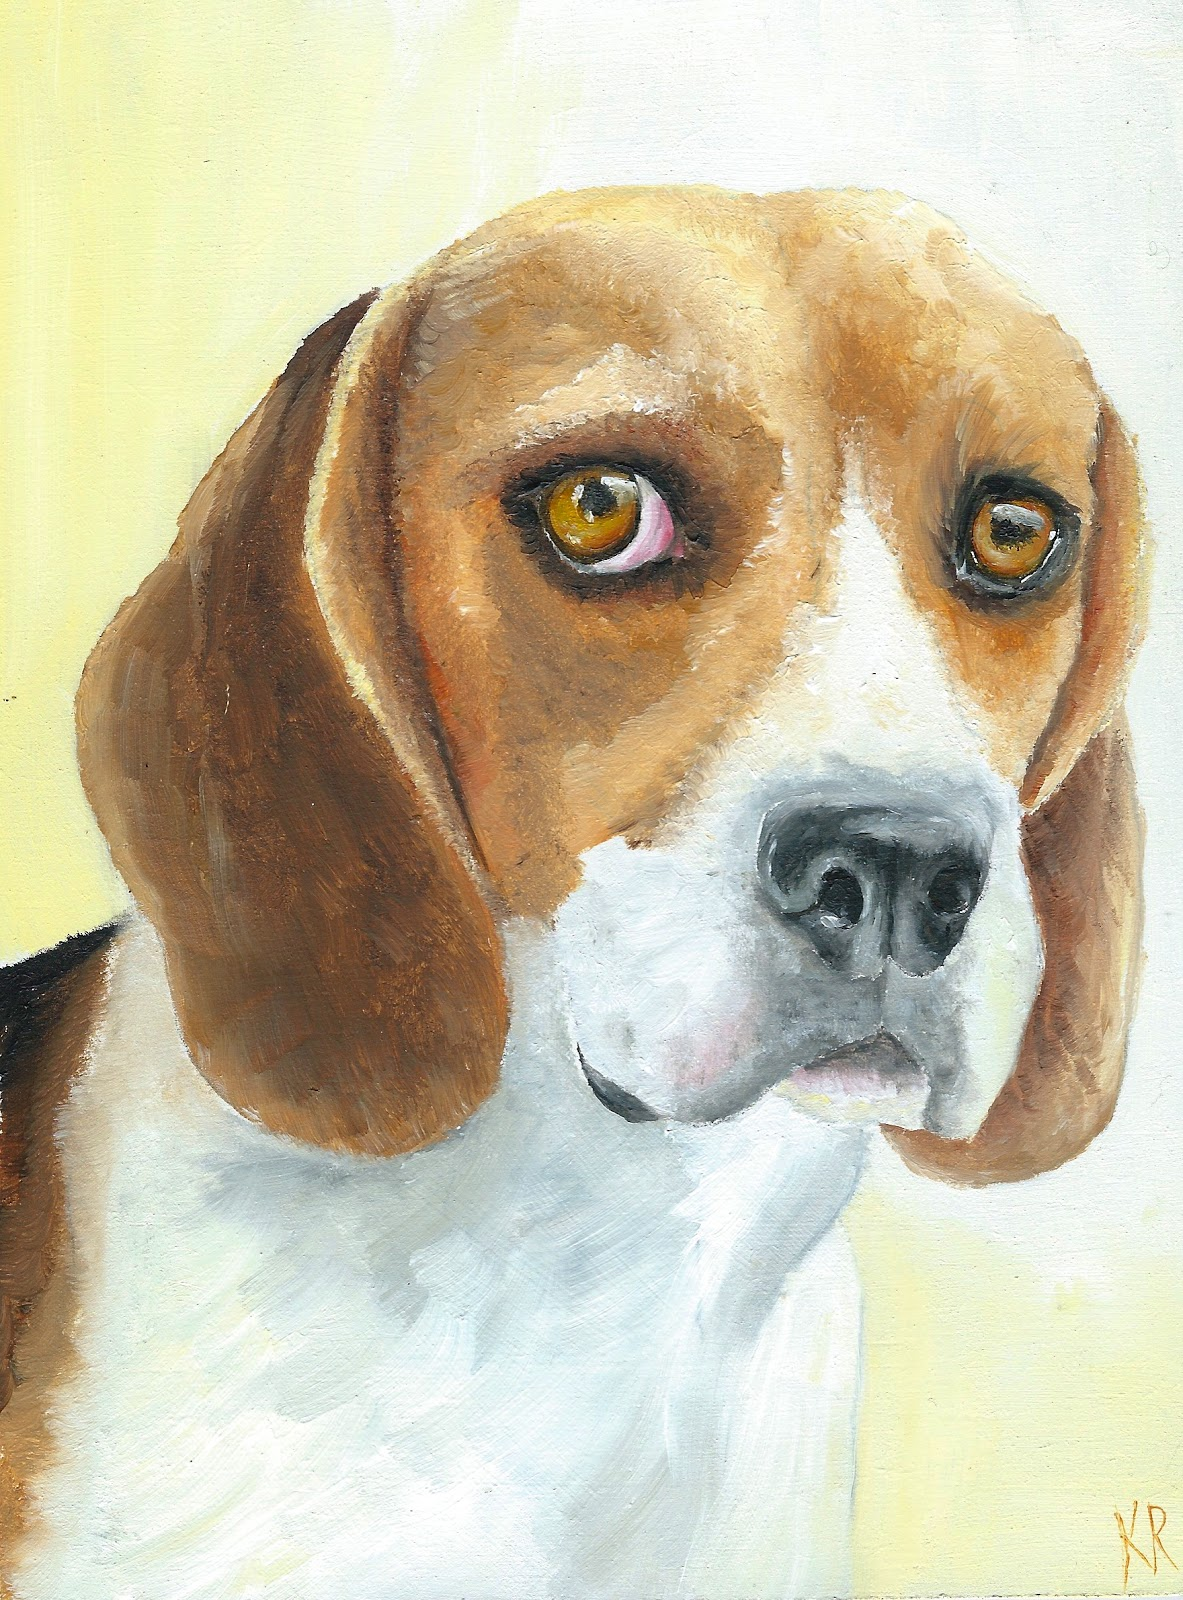 Beagle Wallpaper That Is Animated Wallpapersafari